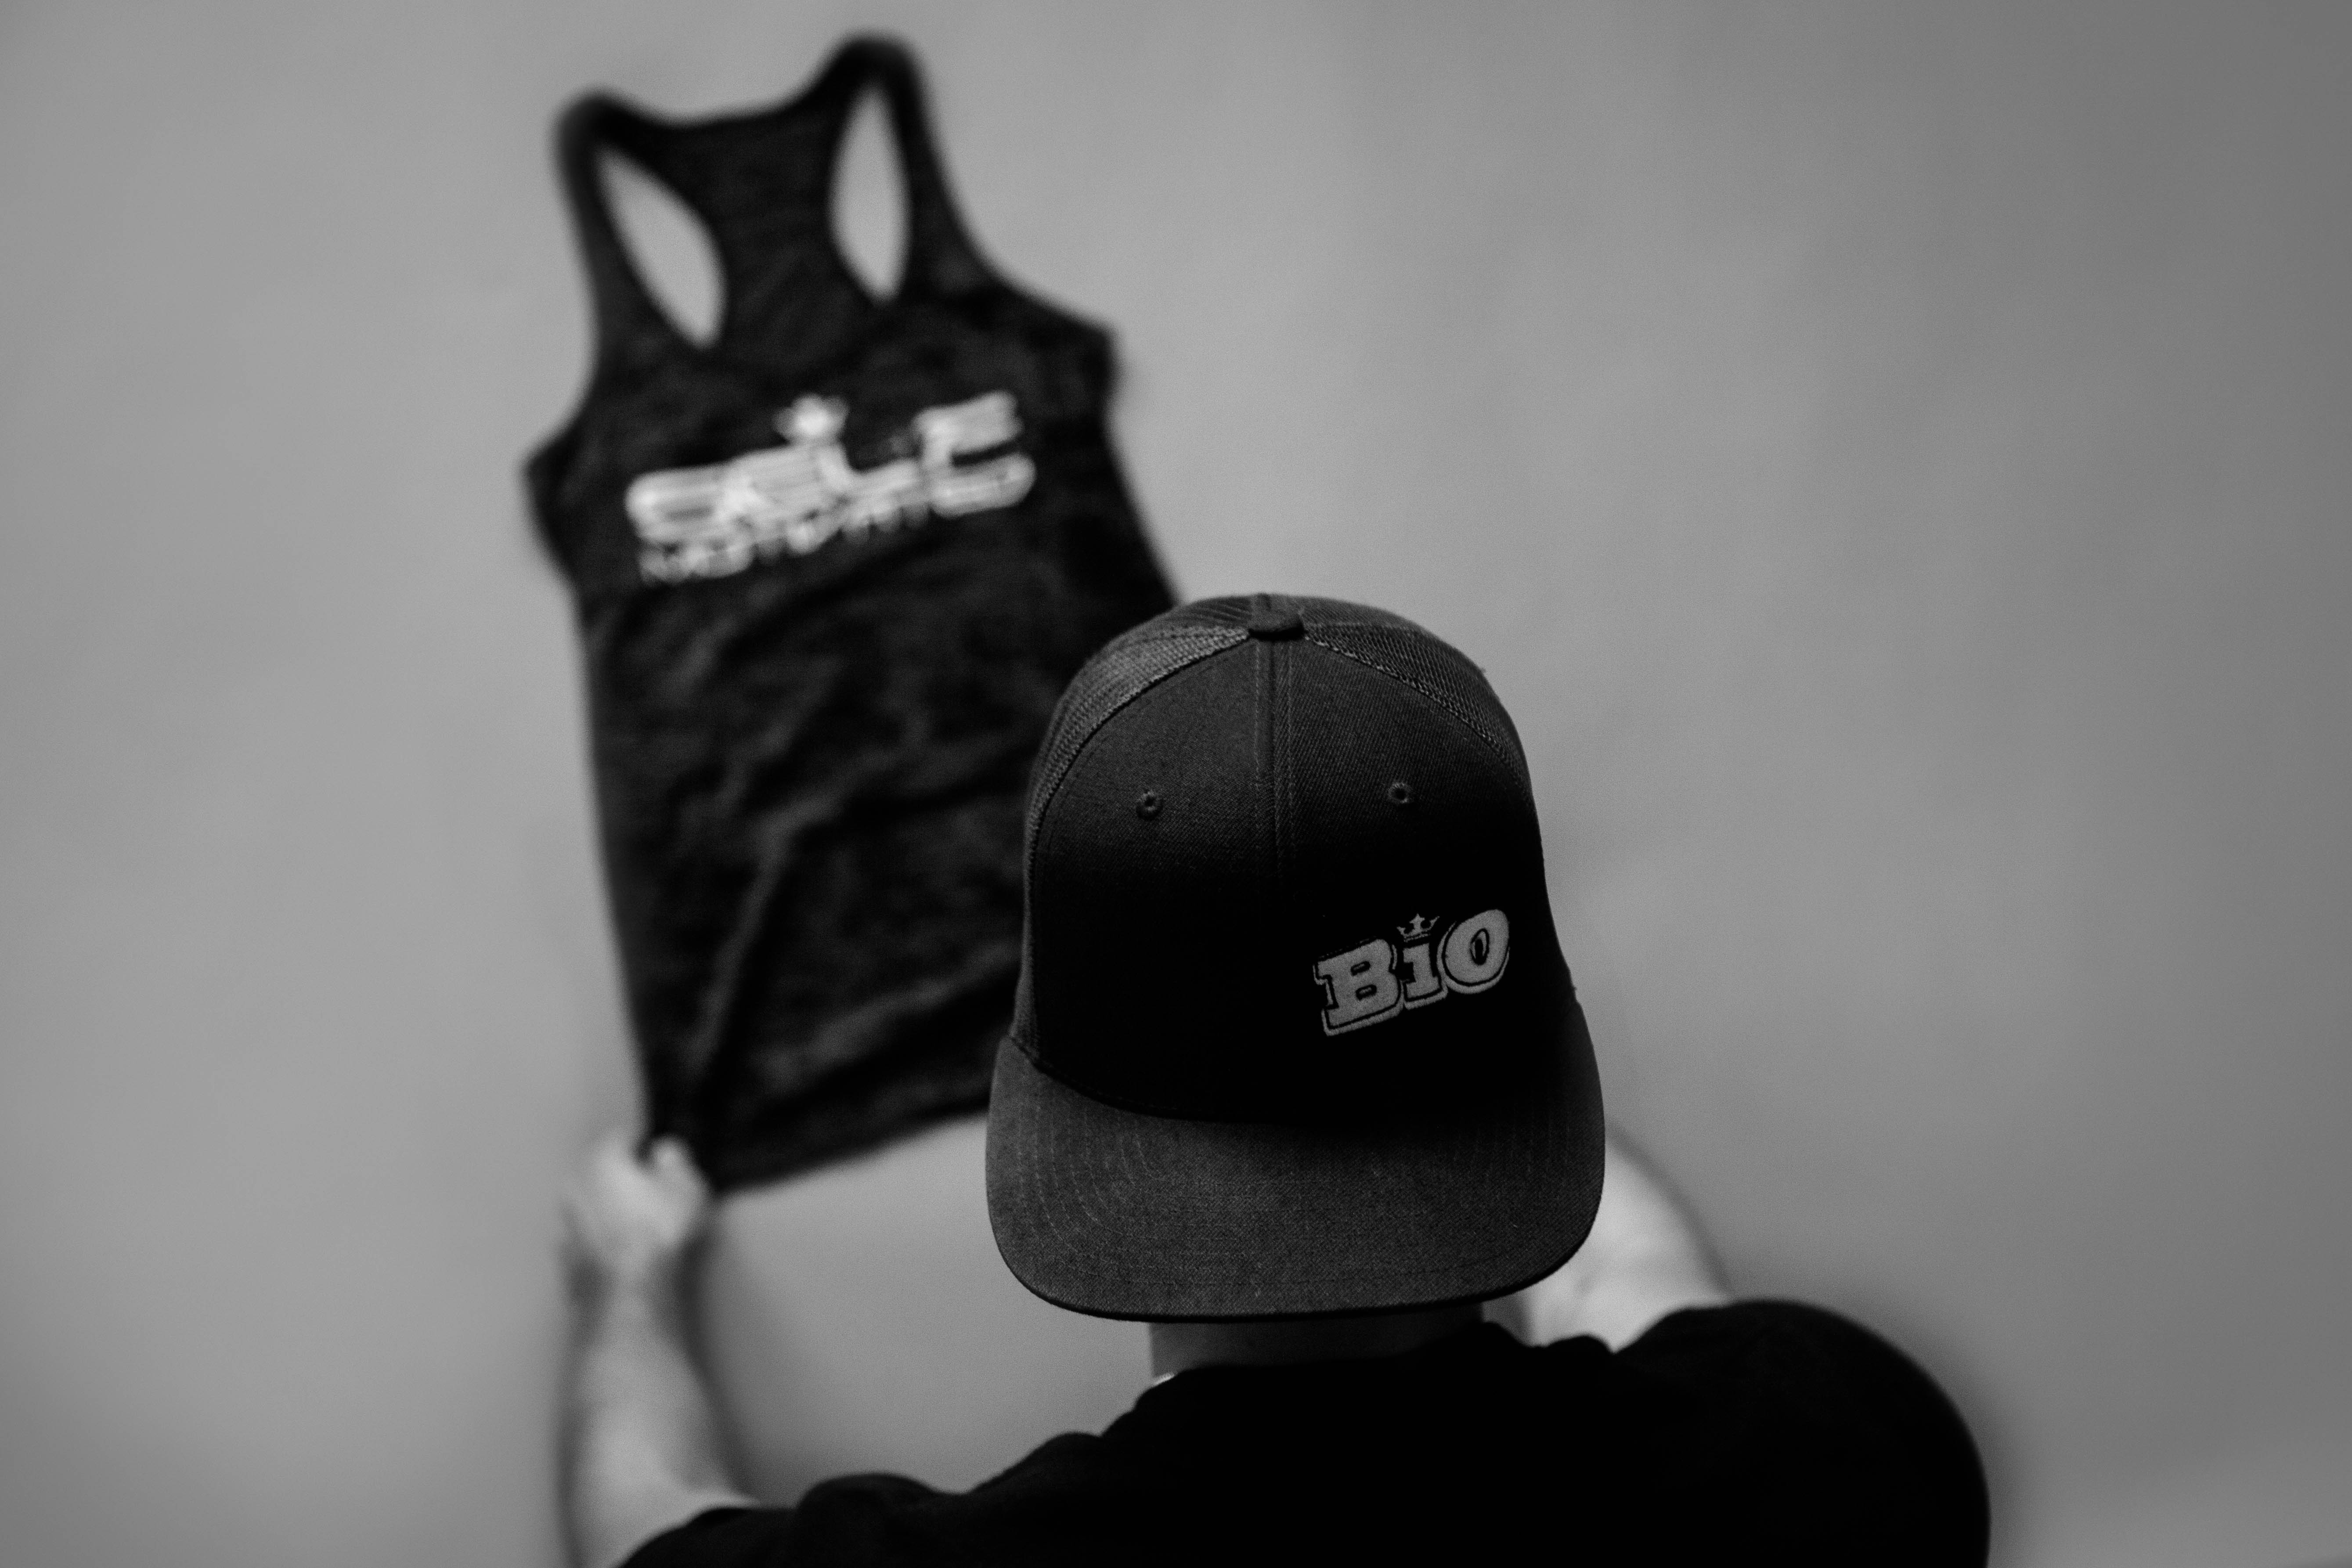 BiO motivational workout clothing